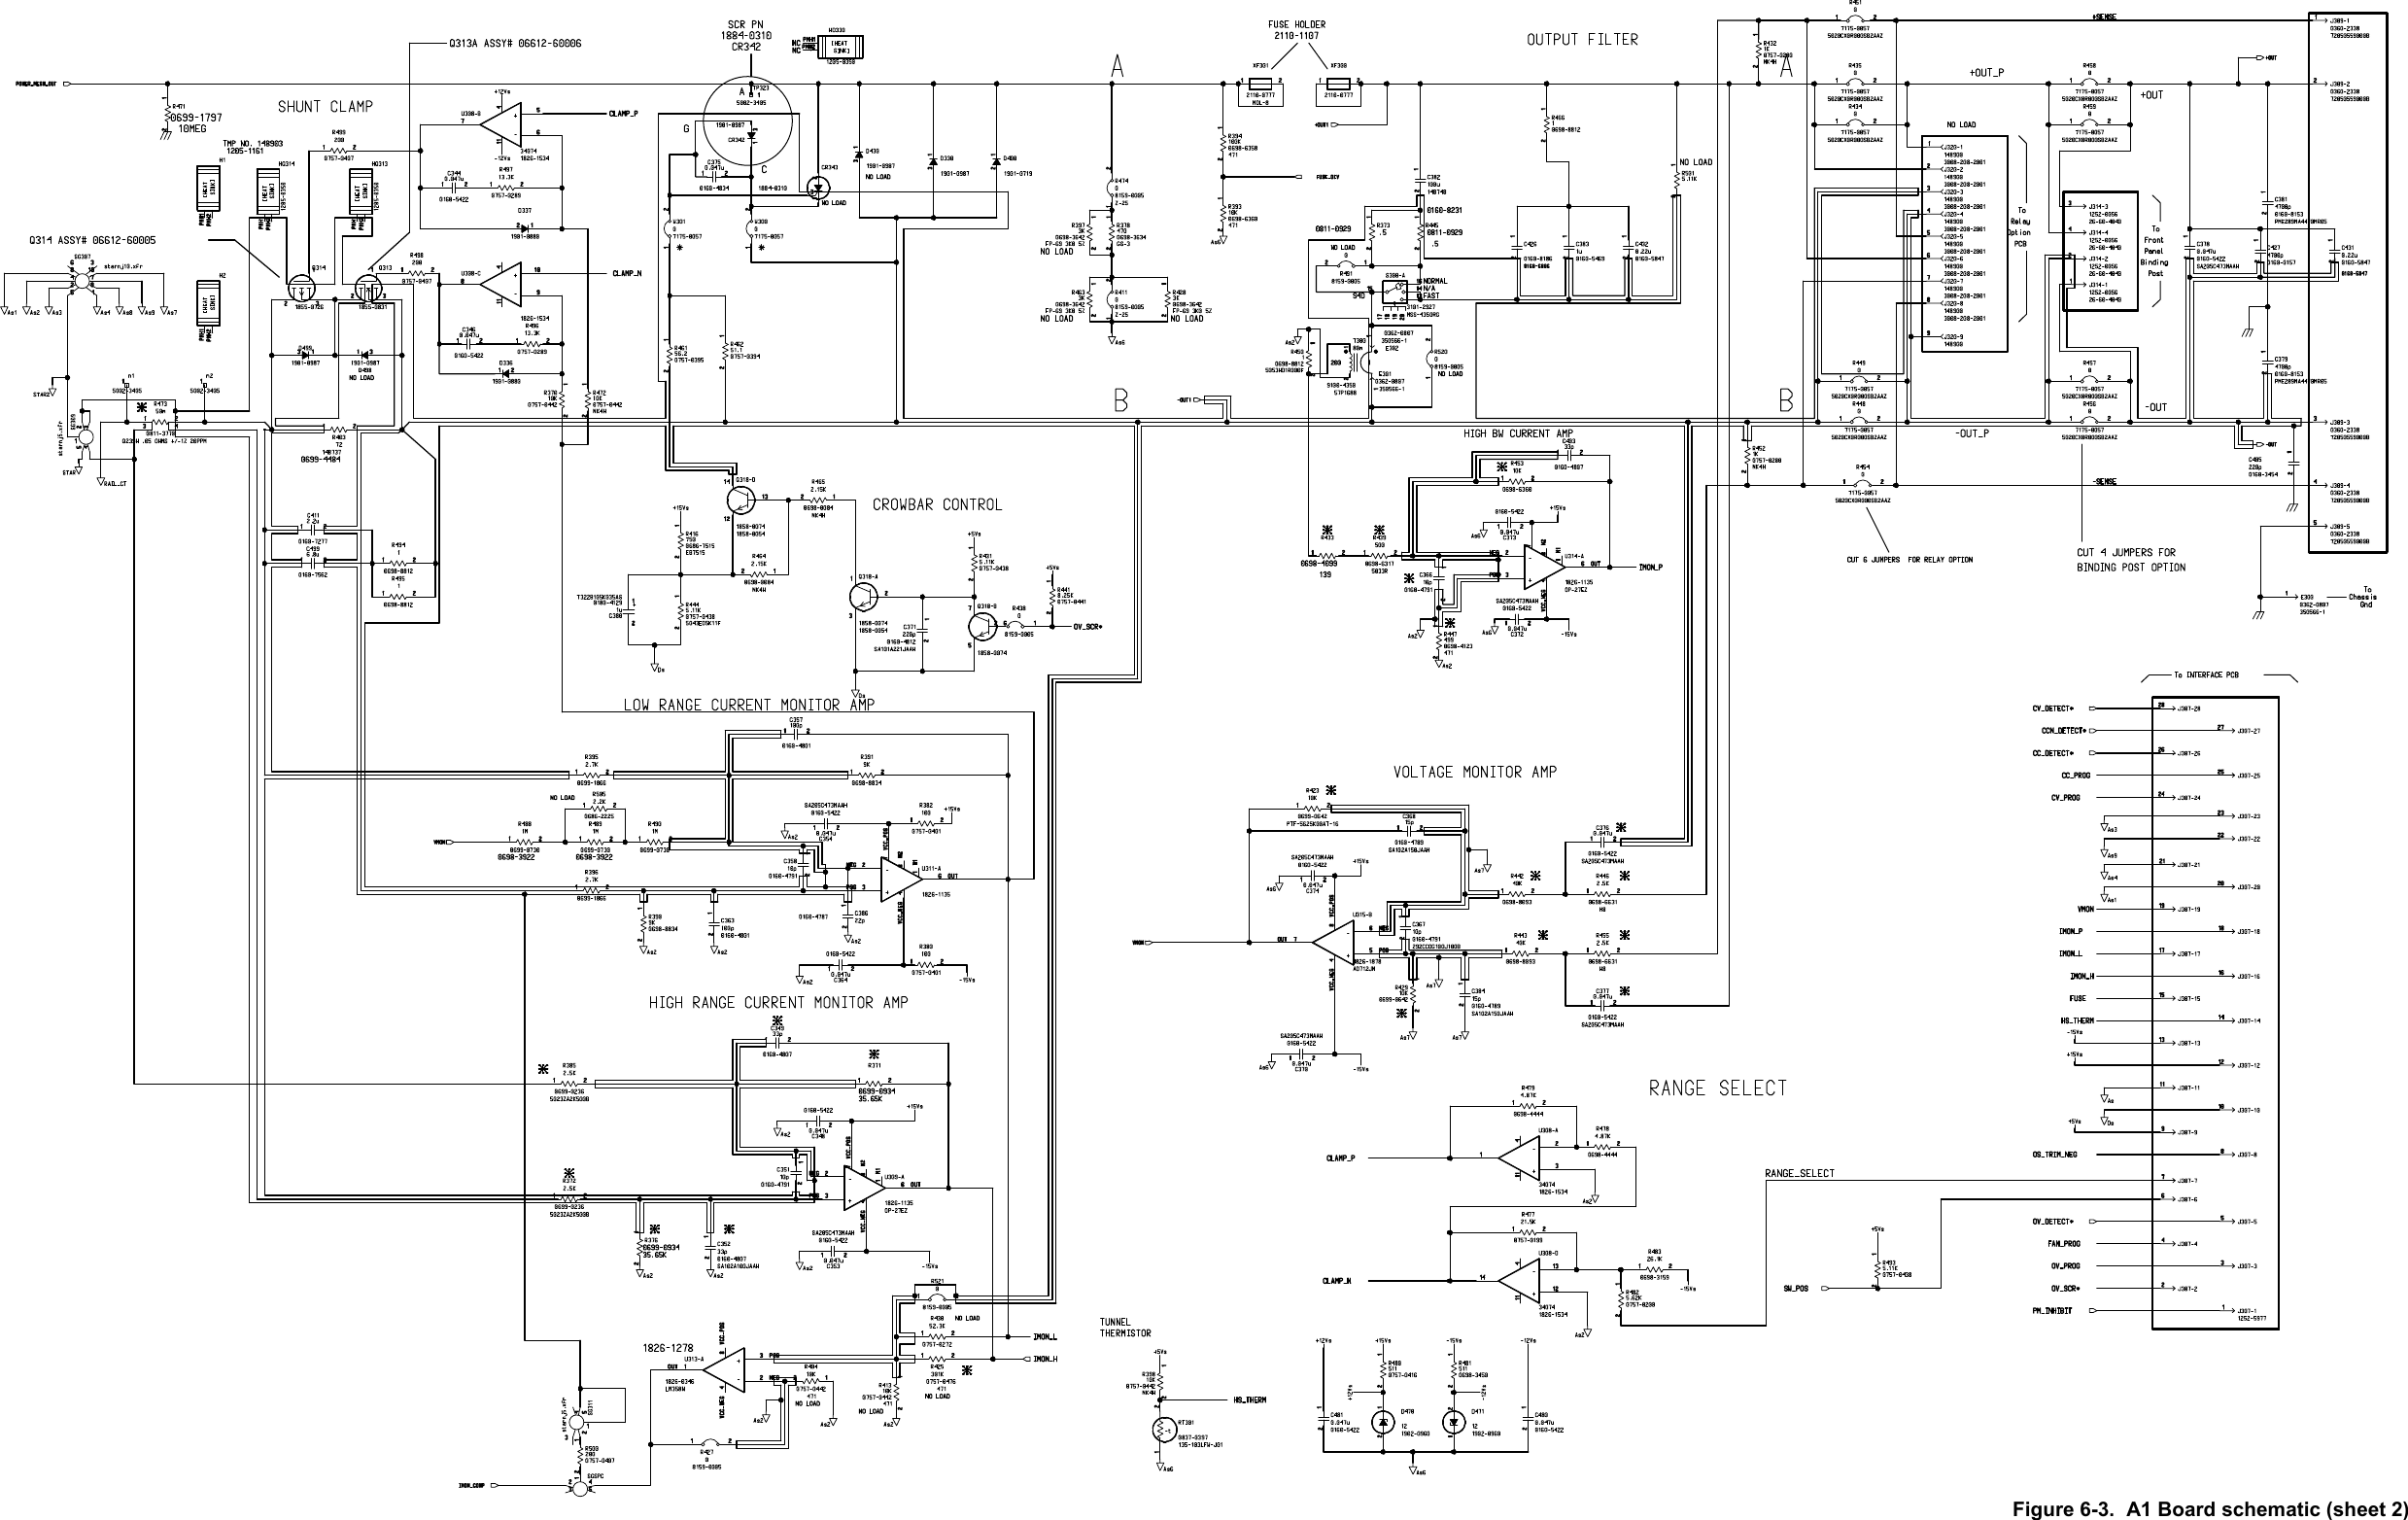 Agilent Technologies Power Supply 6632B Users Manual 66332A, 6634B